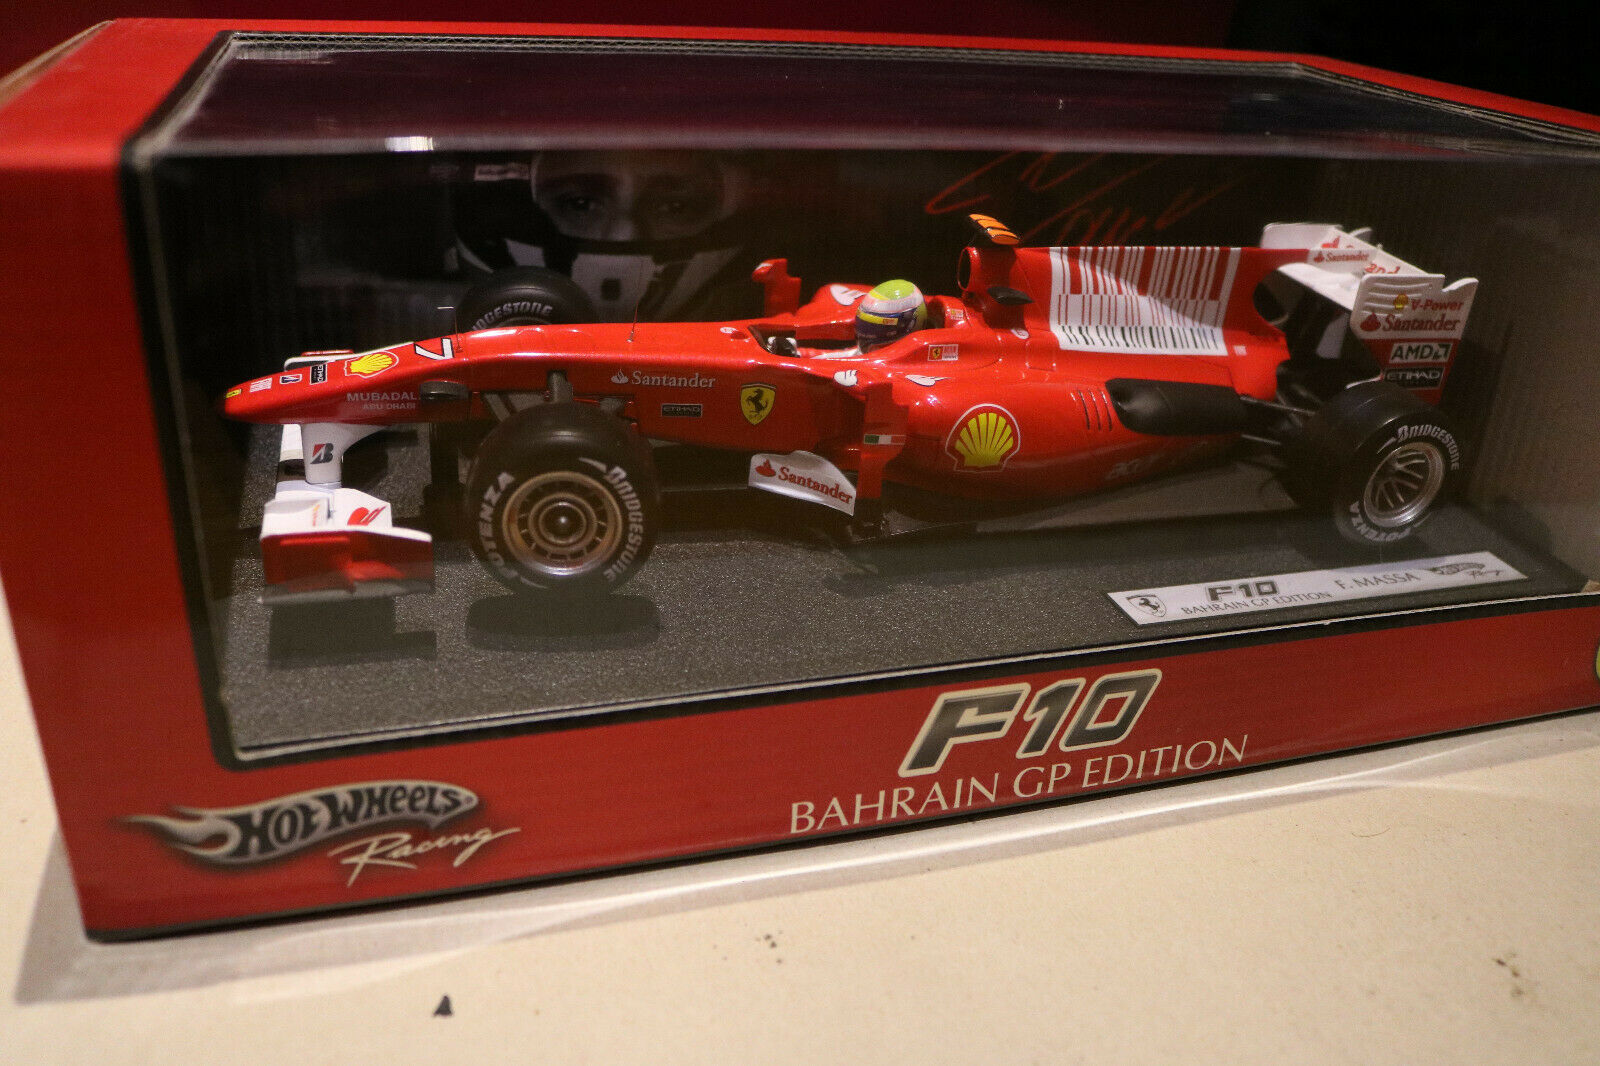 Fórmula 1 felipe massa 1 18 ferrari 2010 f10 Bahréin gp Edition sin abrir en el embalaje original